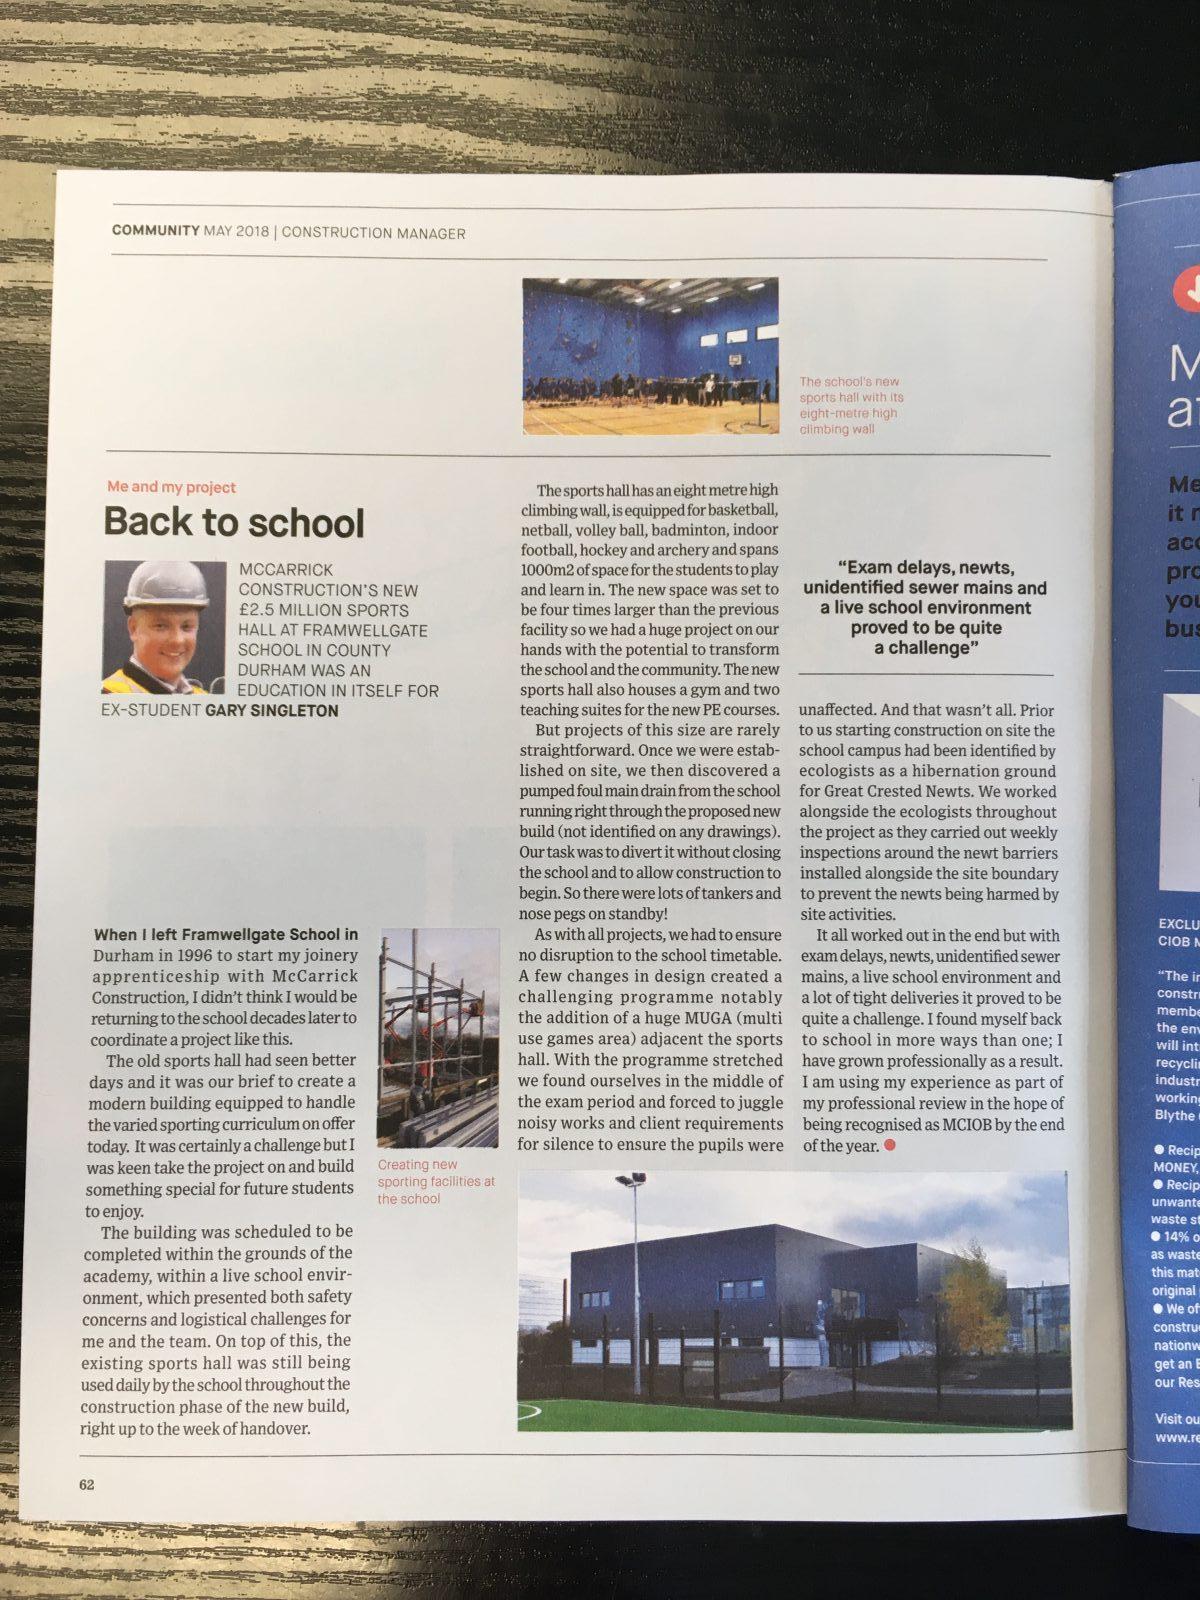 CIOB Magazine article by Gary Singleton